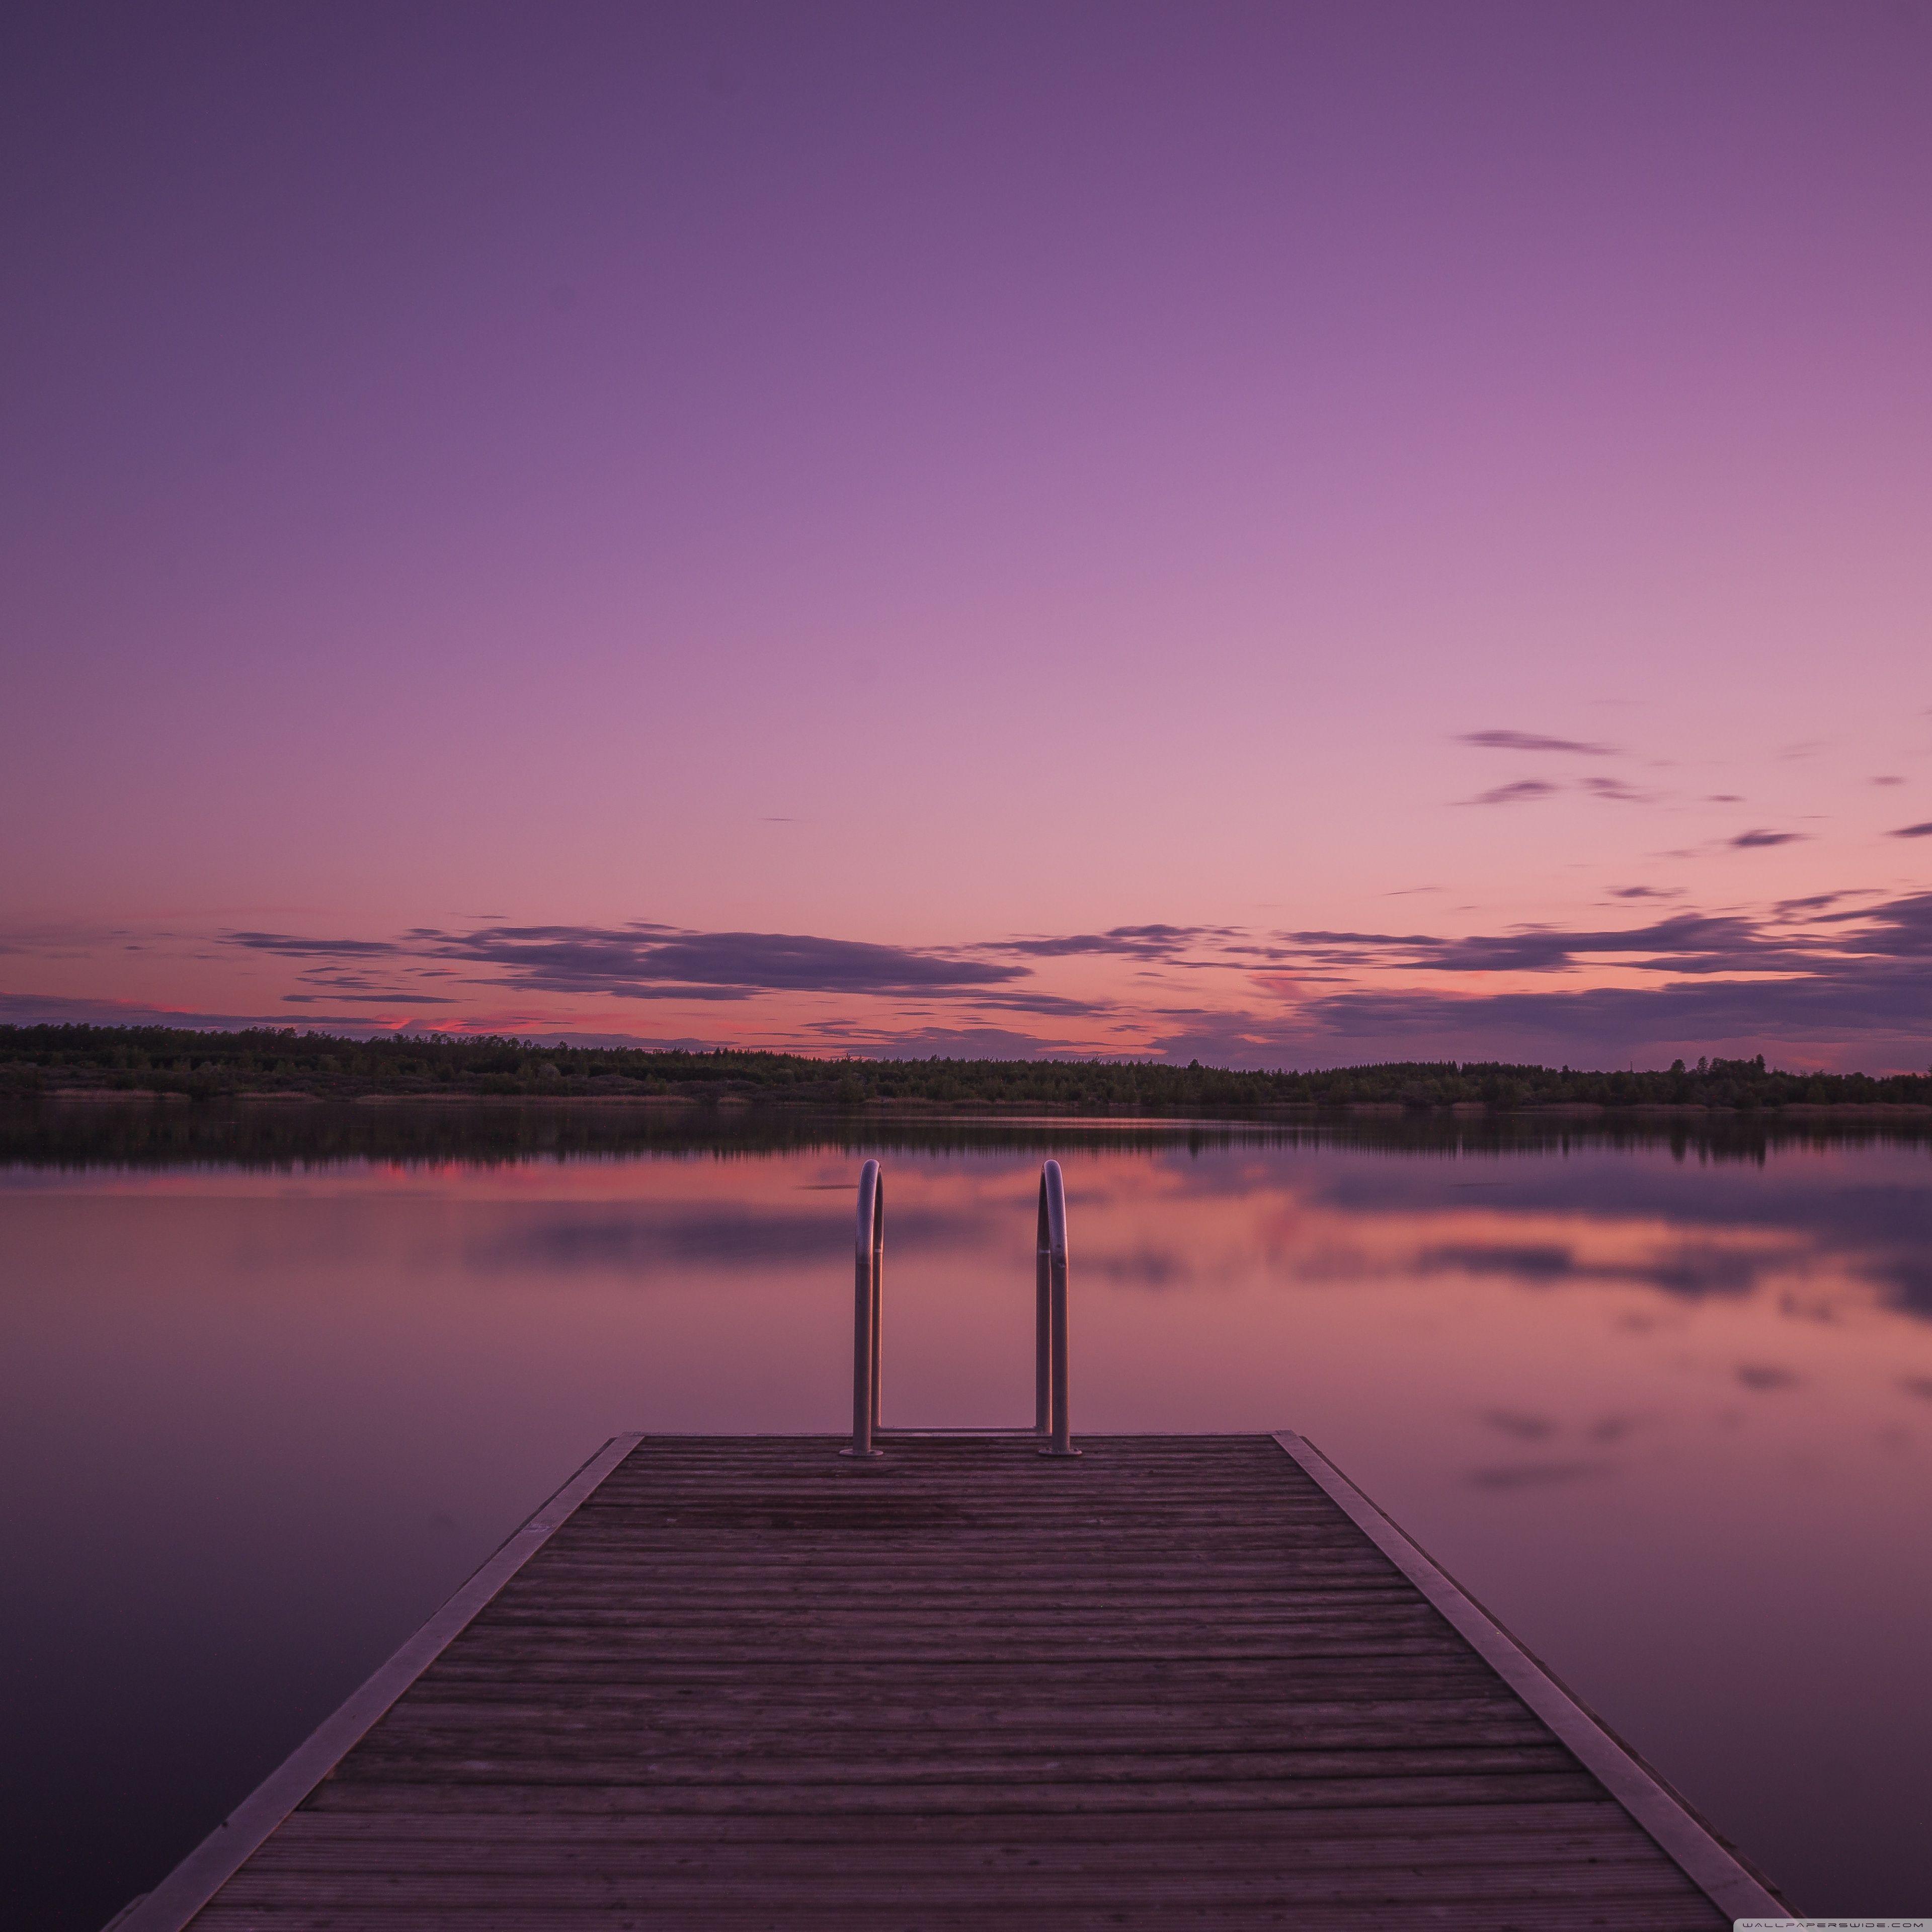 Pin By That Guy On Wild Places Purple Sunset Landscape Wallpaper Desktop Wallpaper